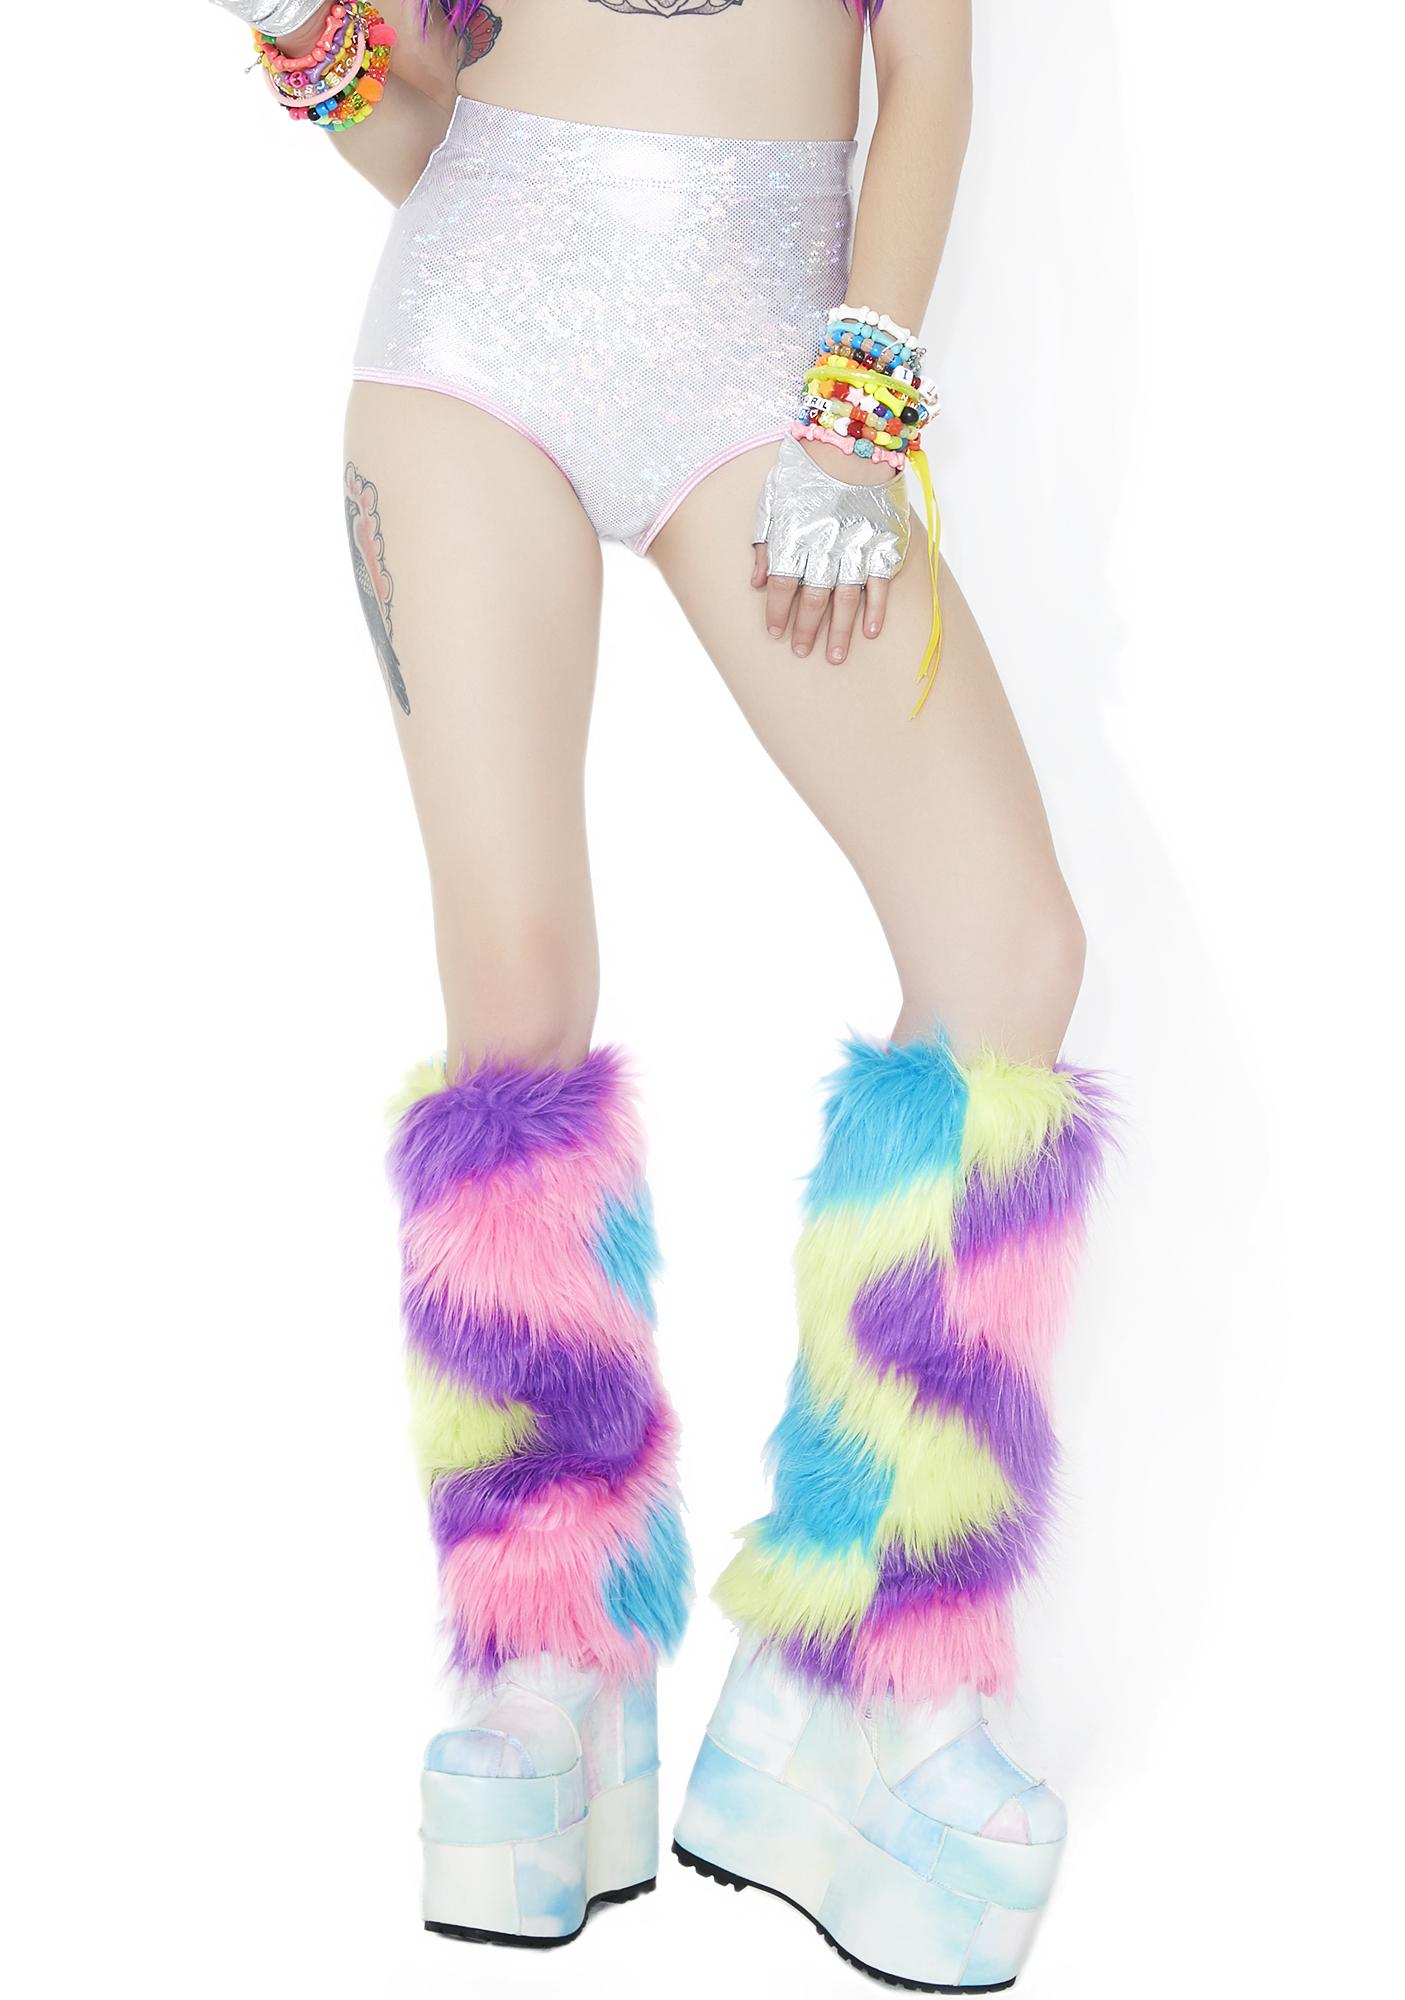 Rave Rainbow Fluffy Leg Warmers